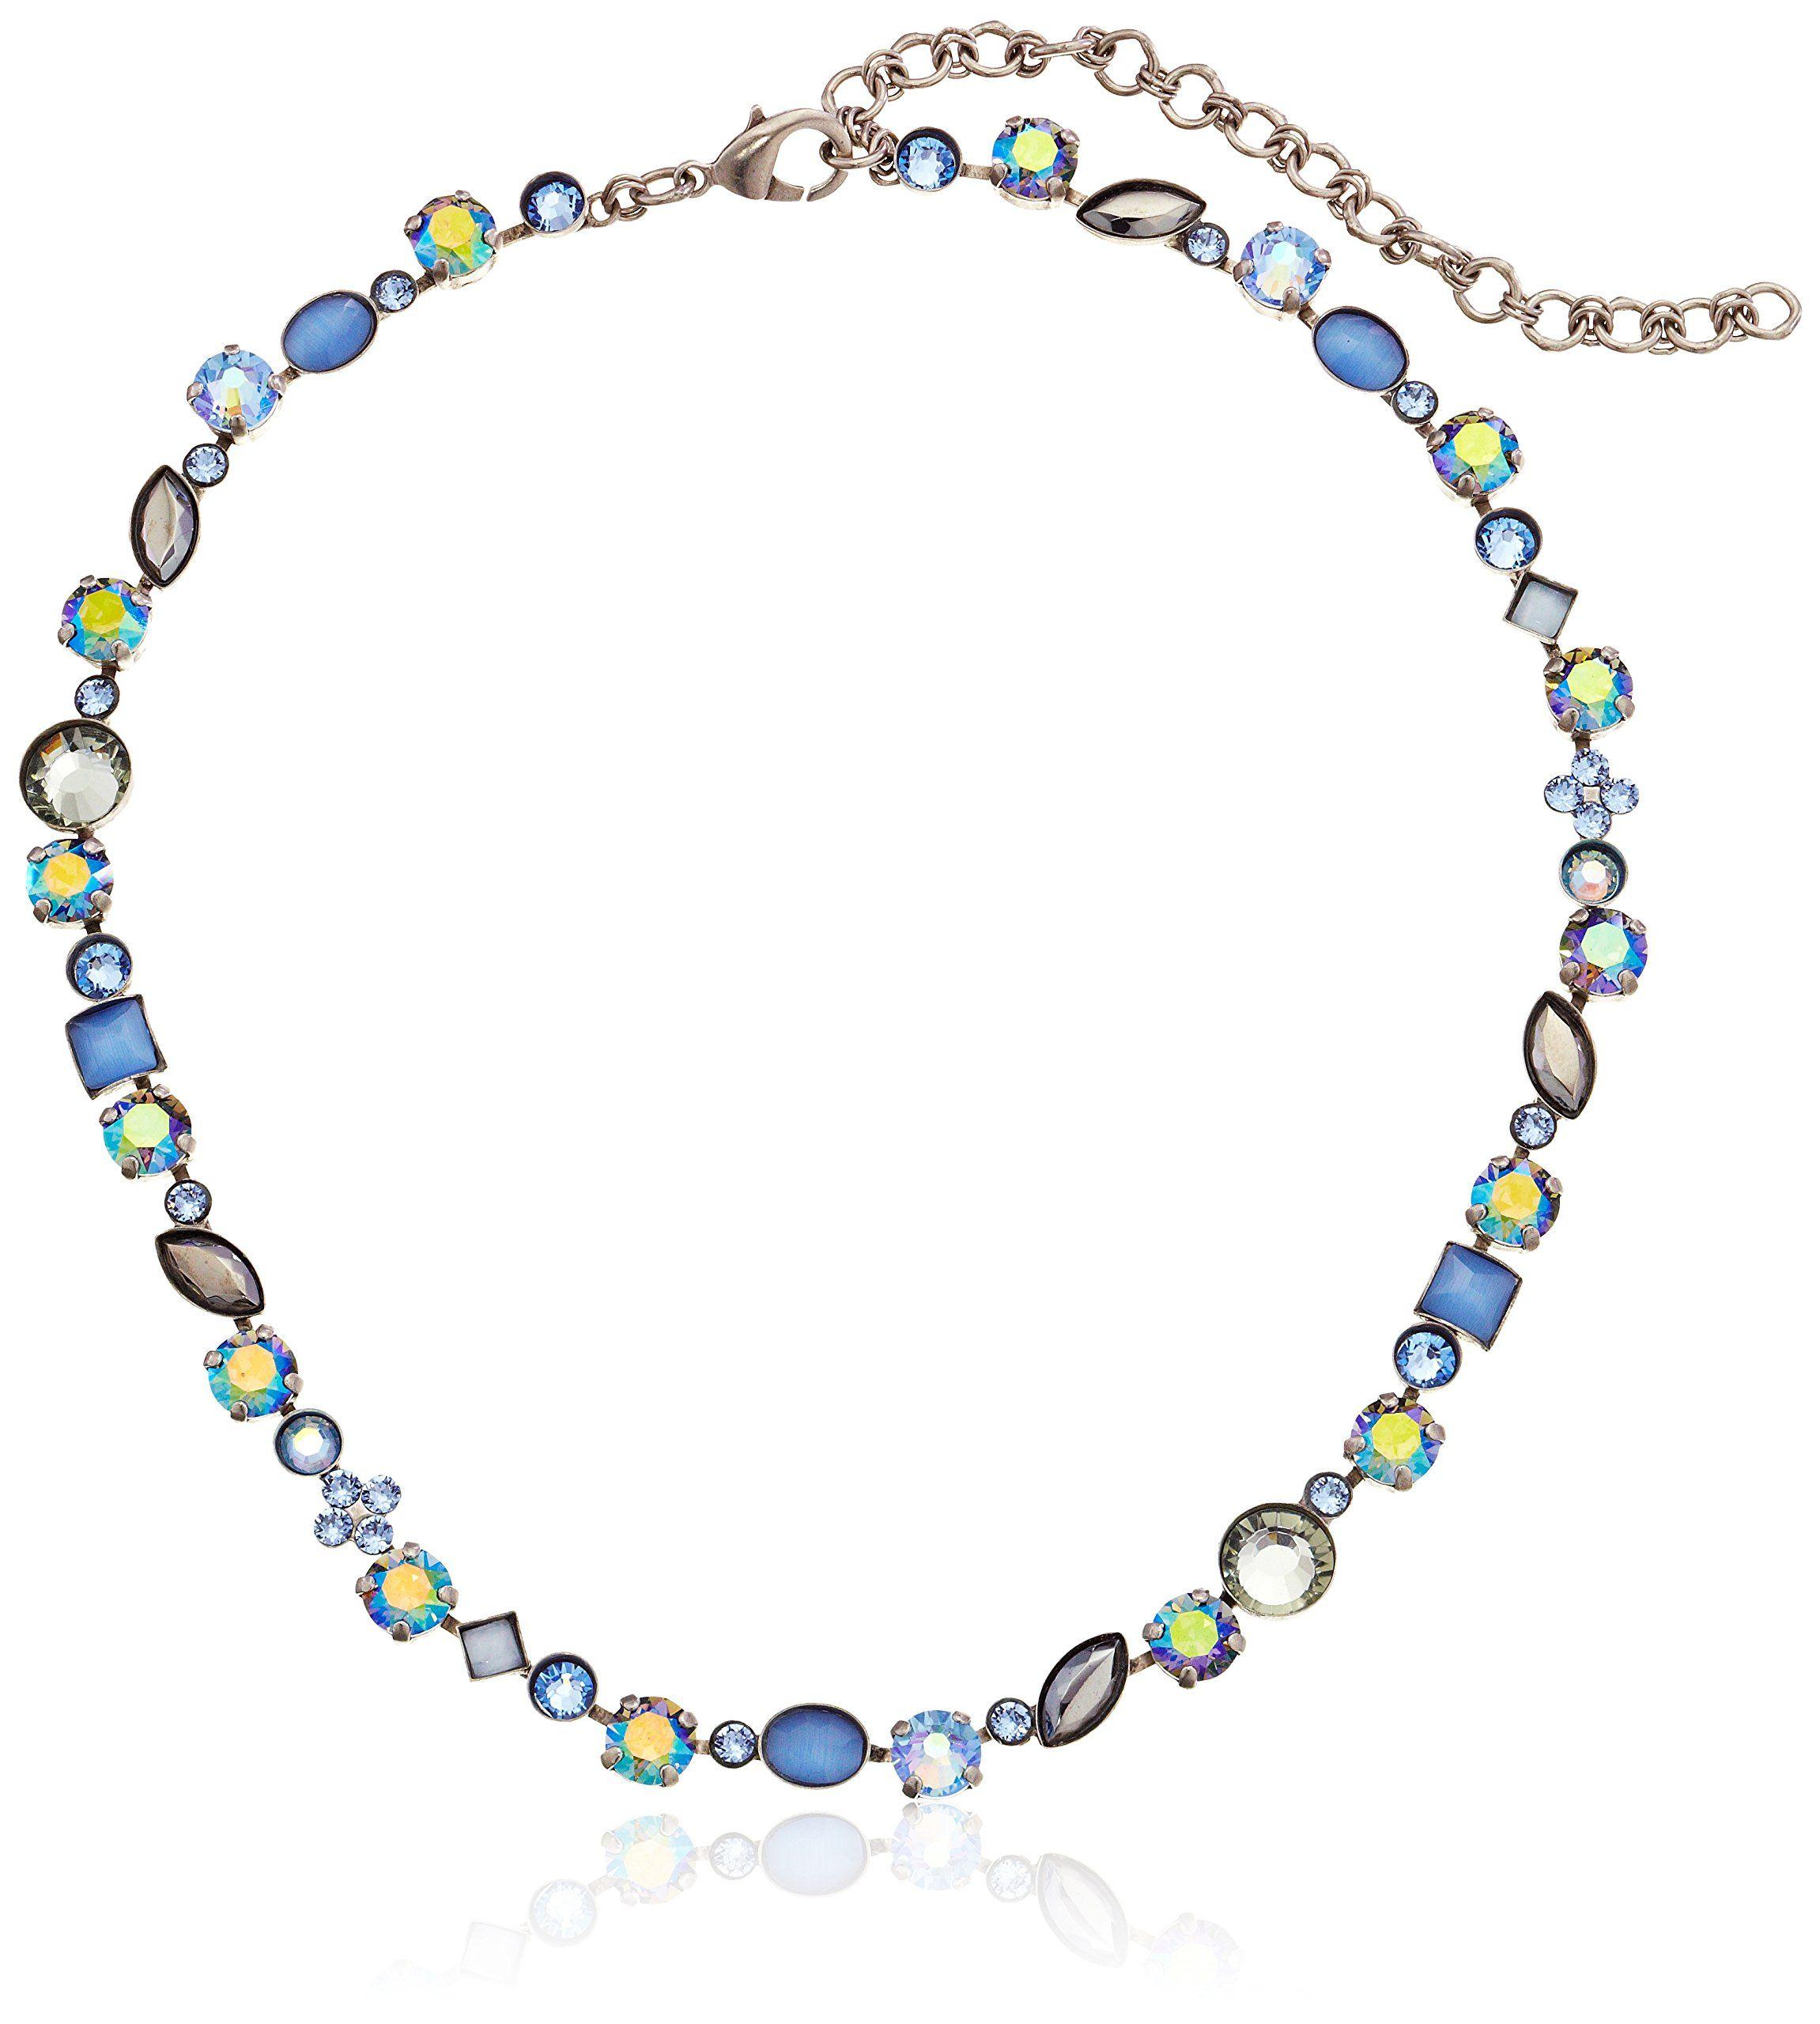 "Amazon.com: Sorrelli ""Sky Blue Peach"" Classic Tee-Shirt Necklace, 15.25"" + 4""extender: Jewelry"